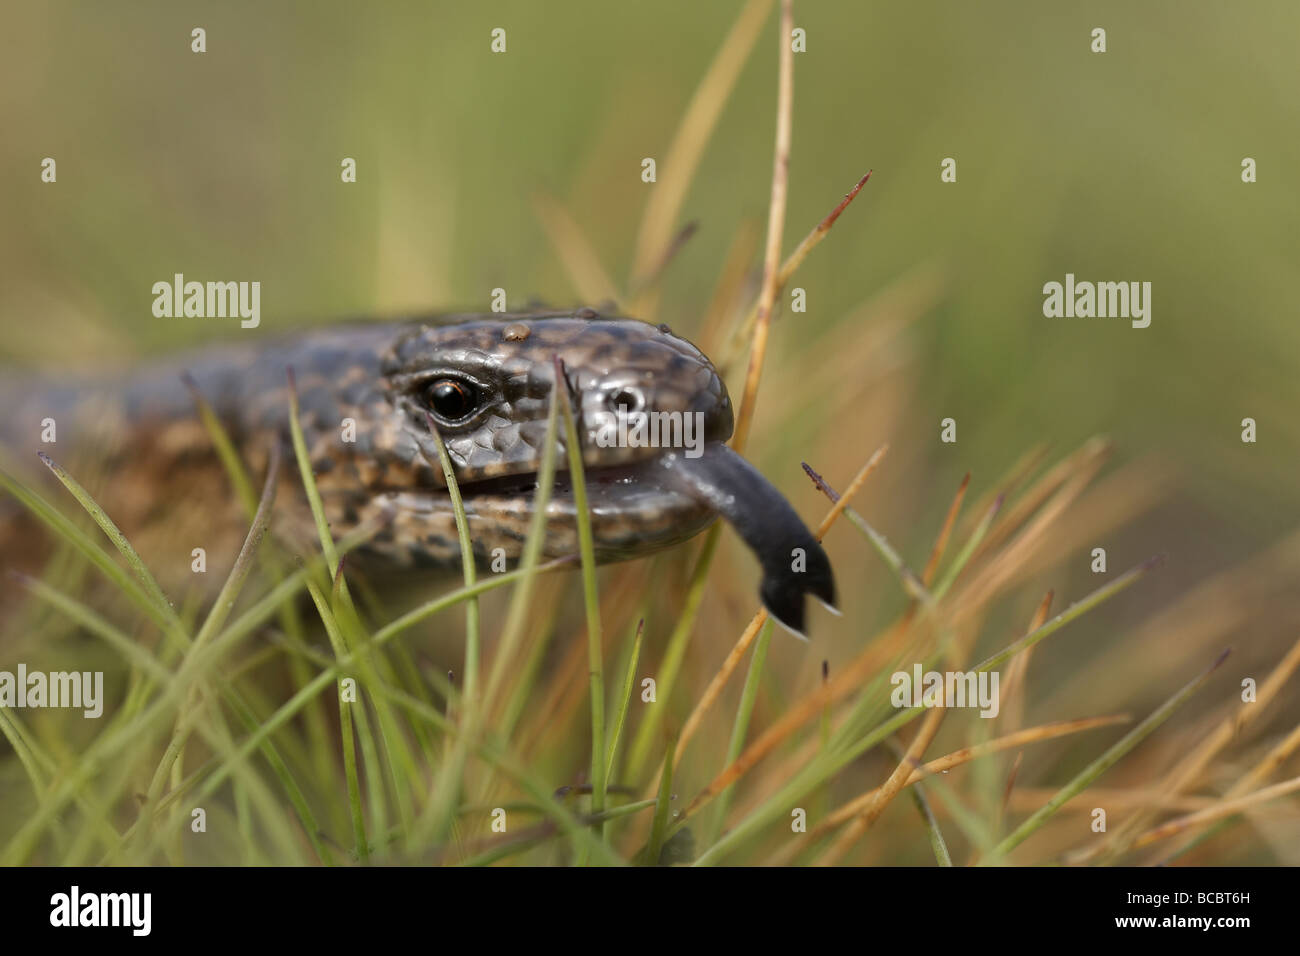 European slow worm Anguis fragilis or blindworm flicking tongue Stock Photo